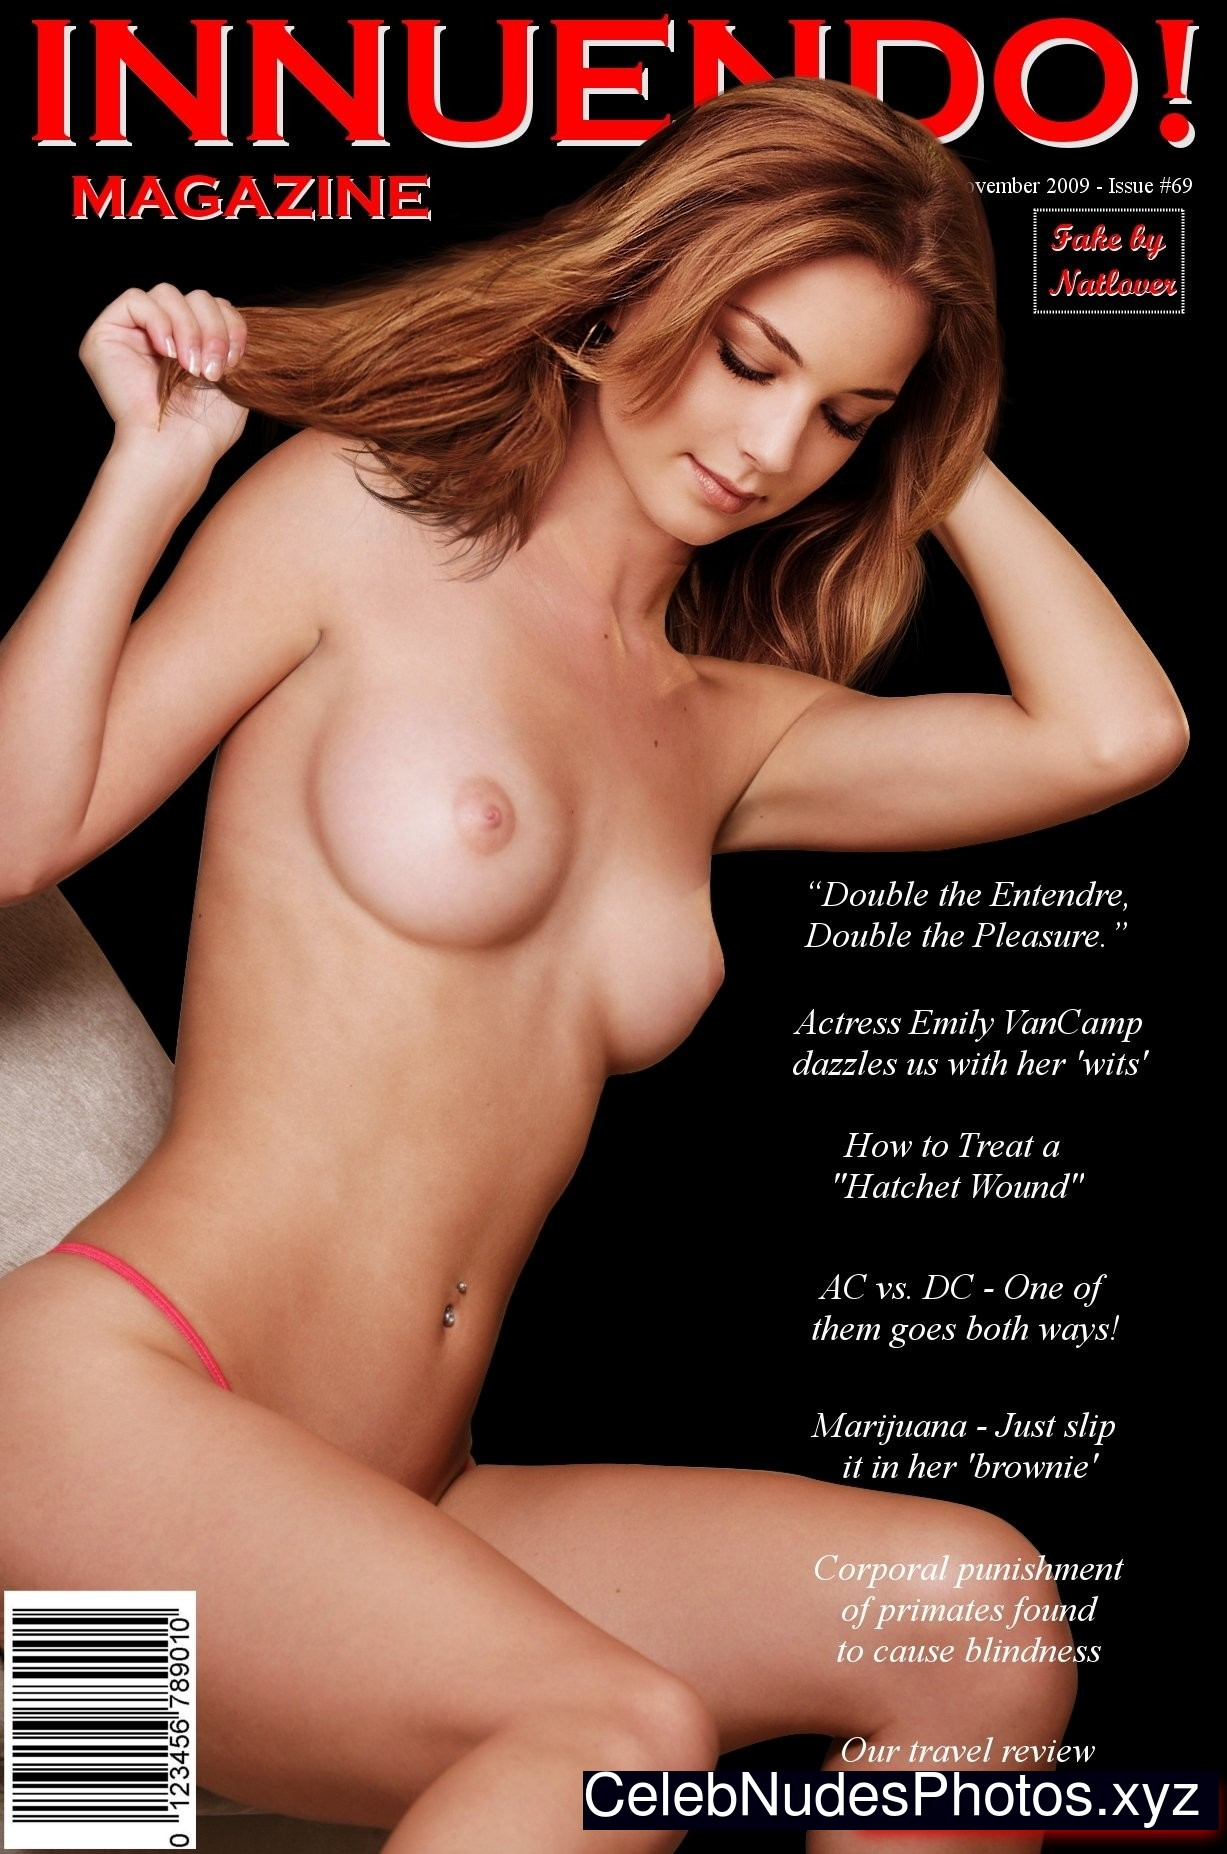 Like naked emily vancamp nude useful question